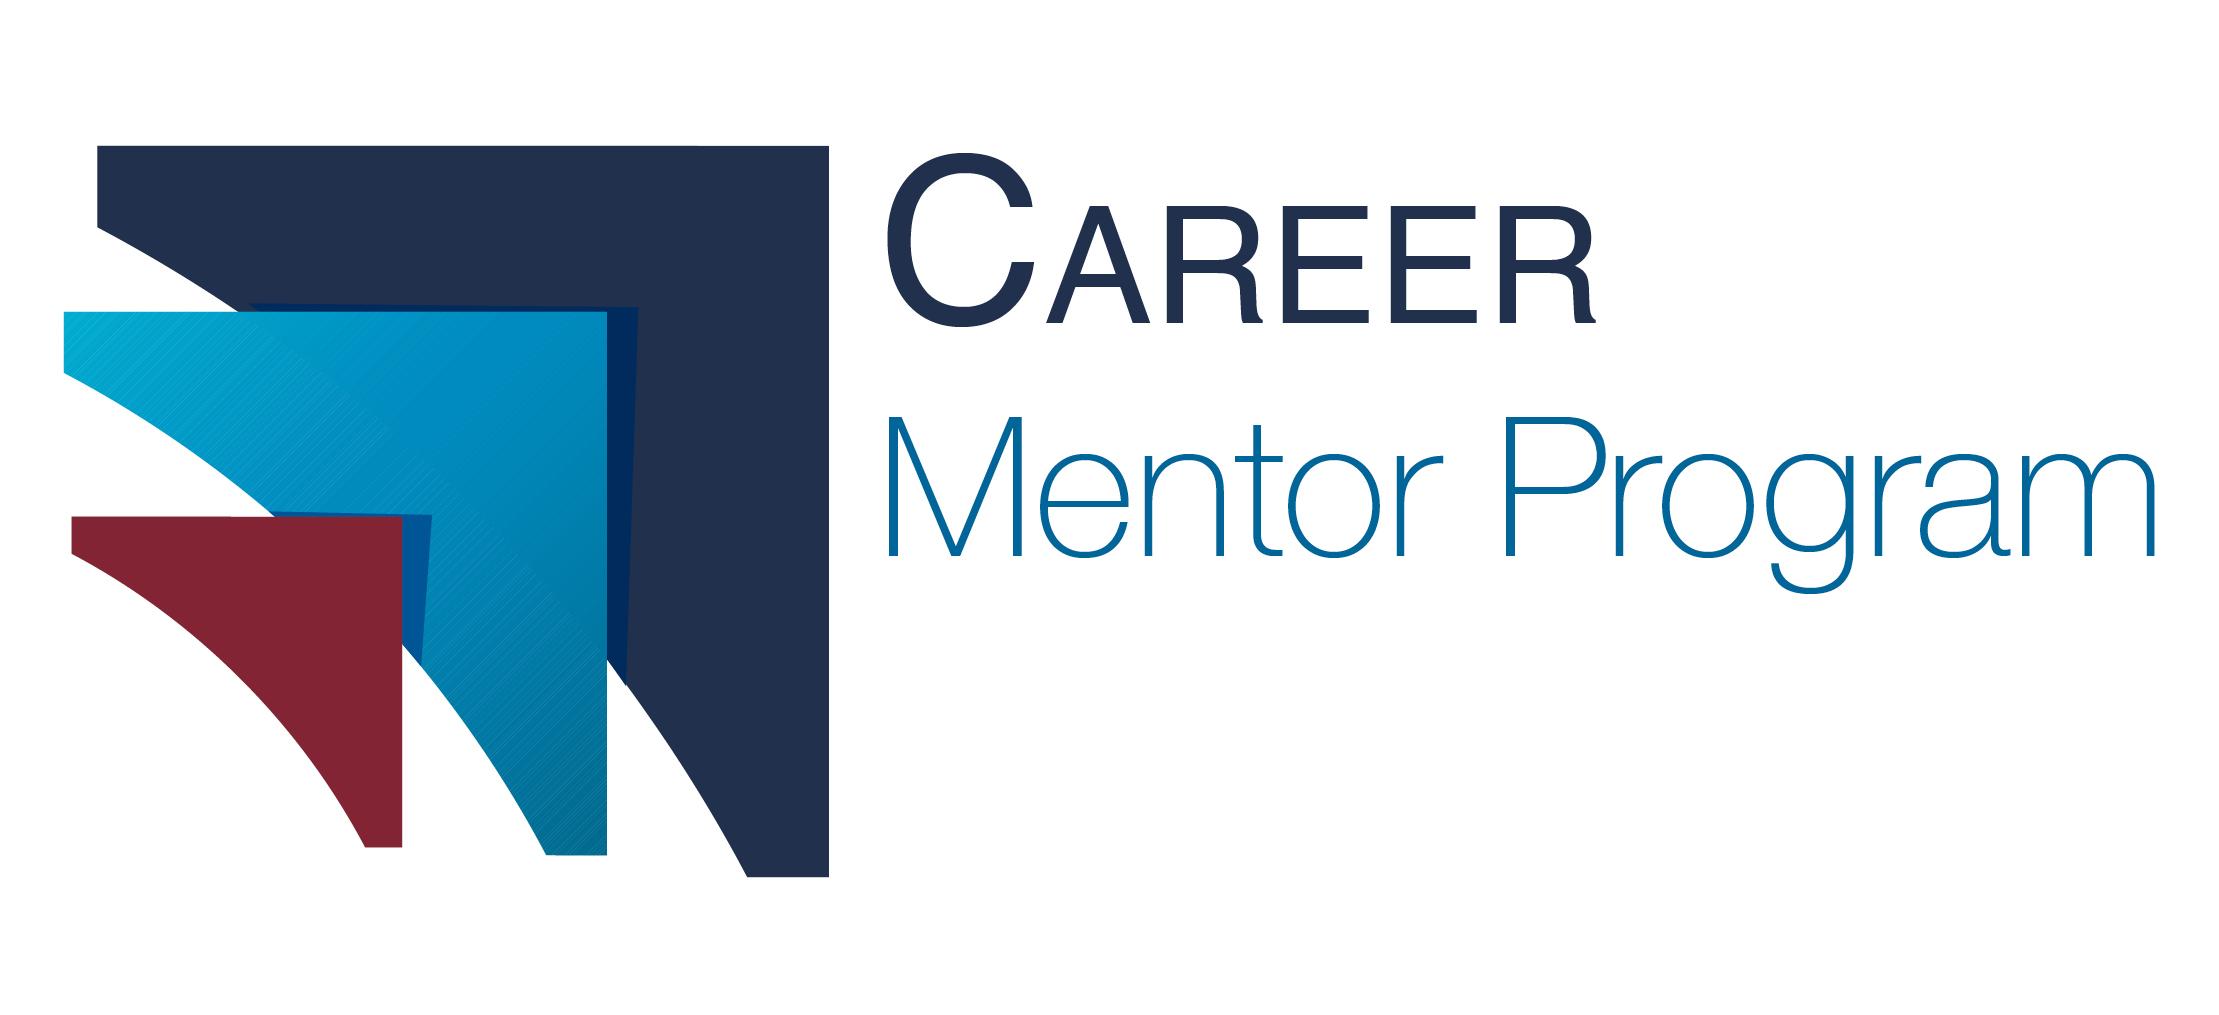 Career Mentor Program - Avon Old Farms